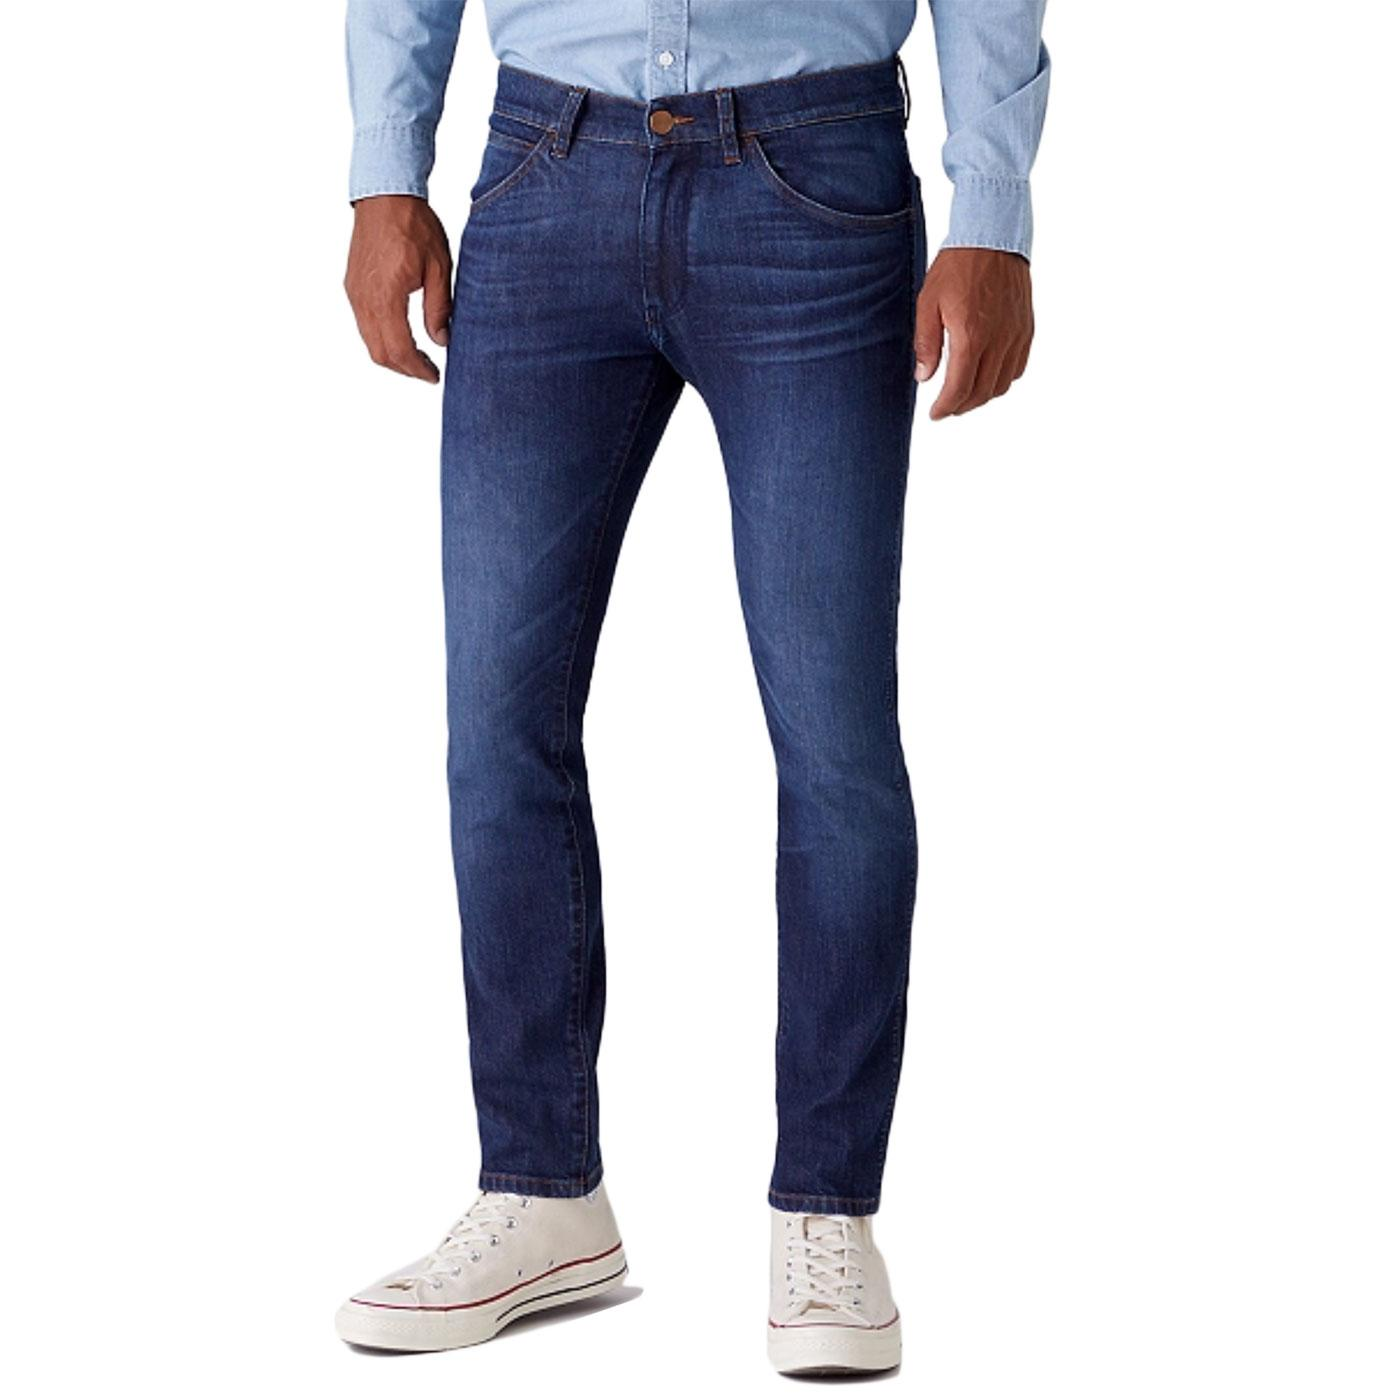 Bryson WRANGLER The Outlaw Mod Skinny Jeans